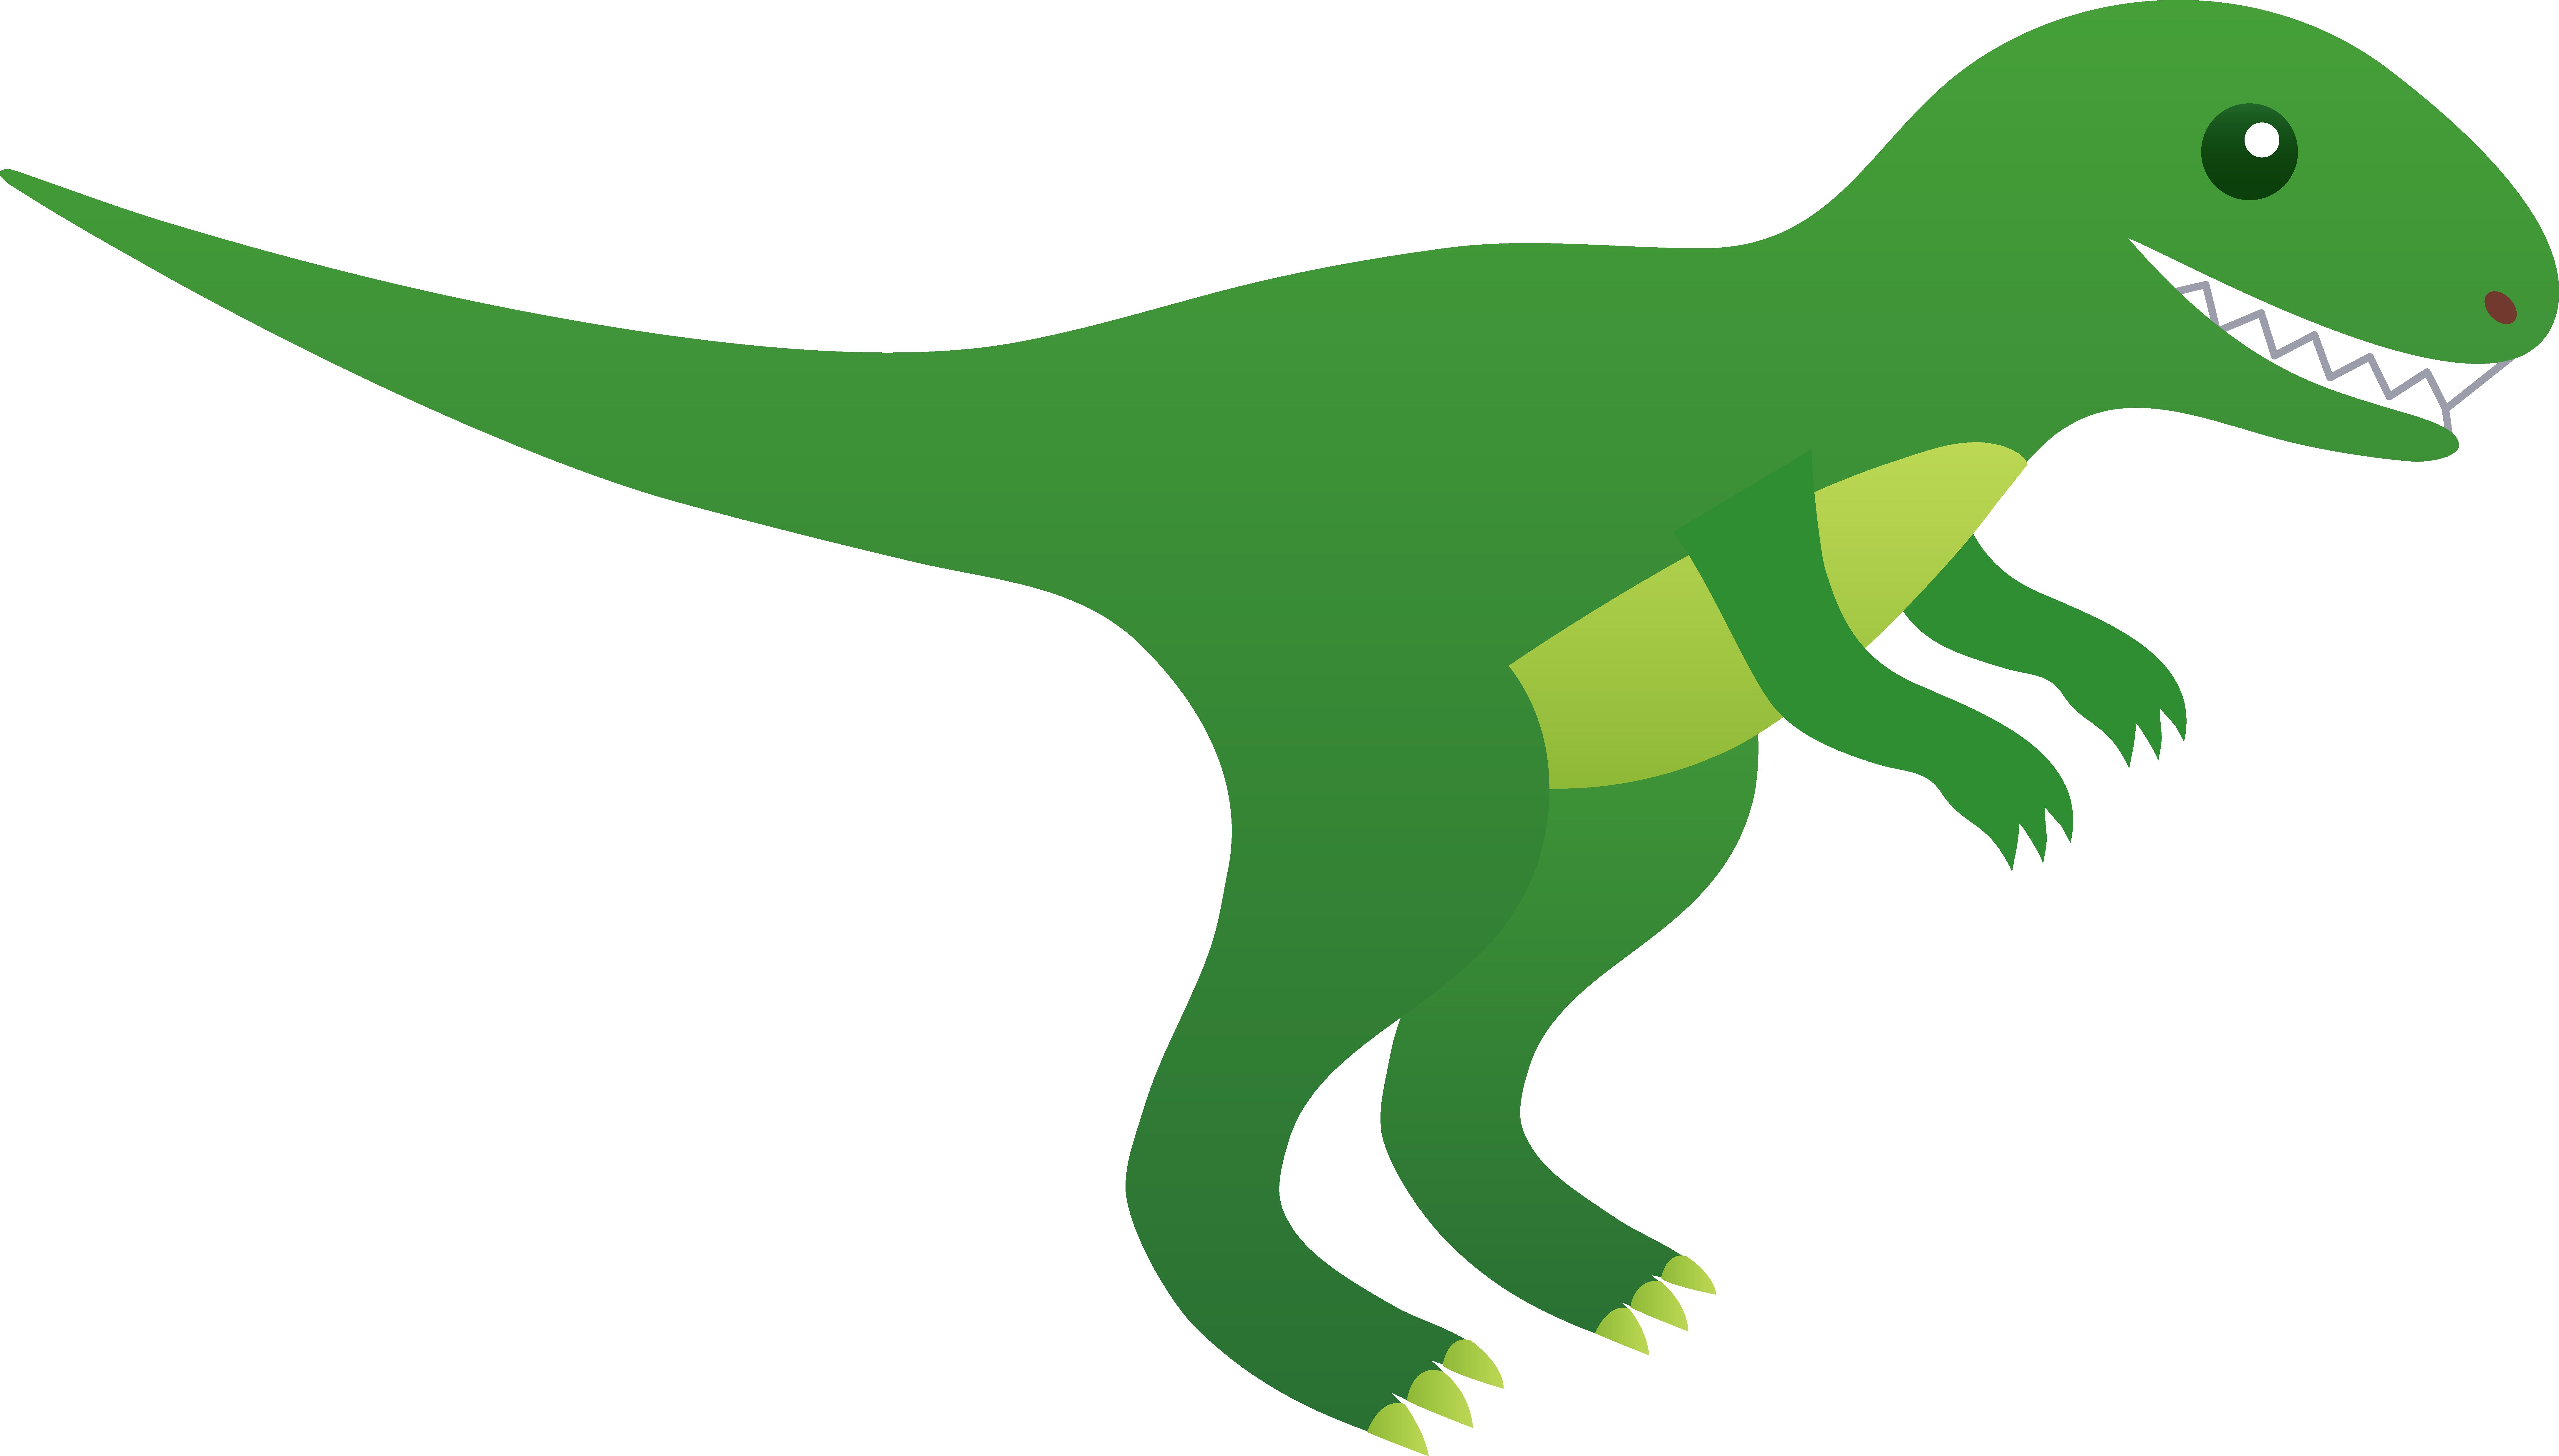 T Rex Dinosaur Free Clipart